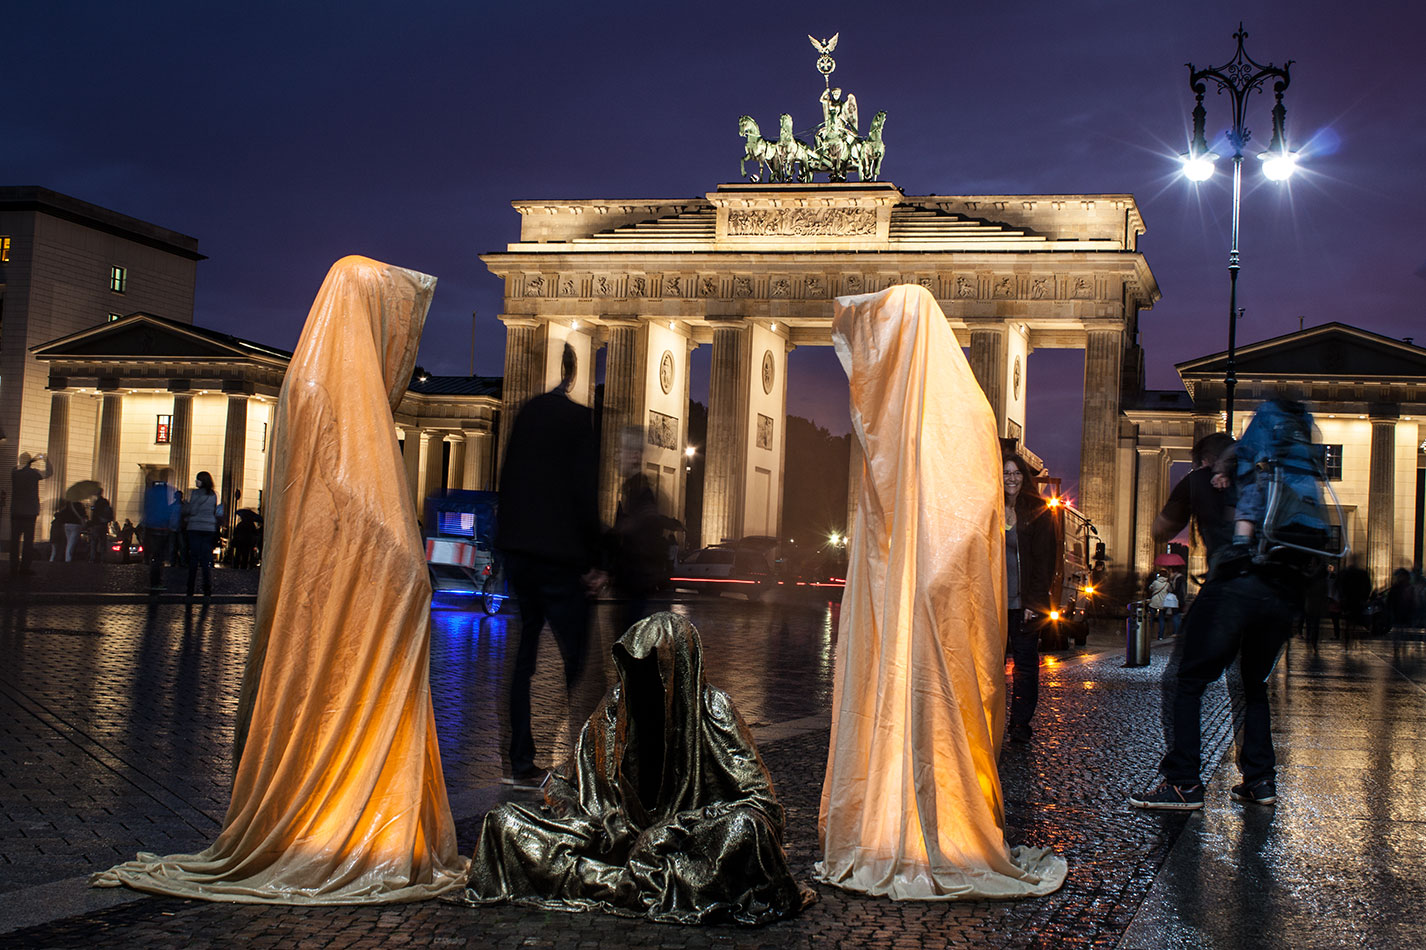 festival-of-lights-berlin-brandenburg-gate-light-art-show-exhibition-lumina-guardians-of-time-manfred-kili-kielnhofer-contemporary-arts-design-sculpture-3261